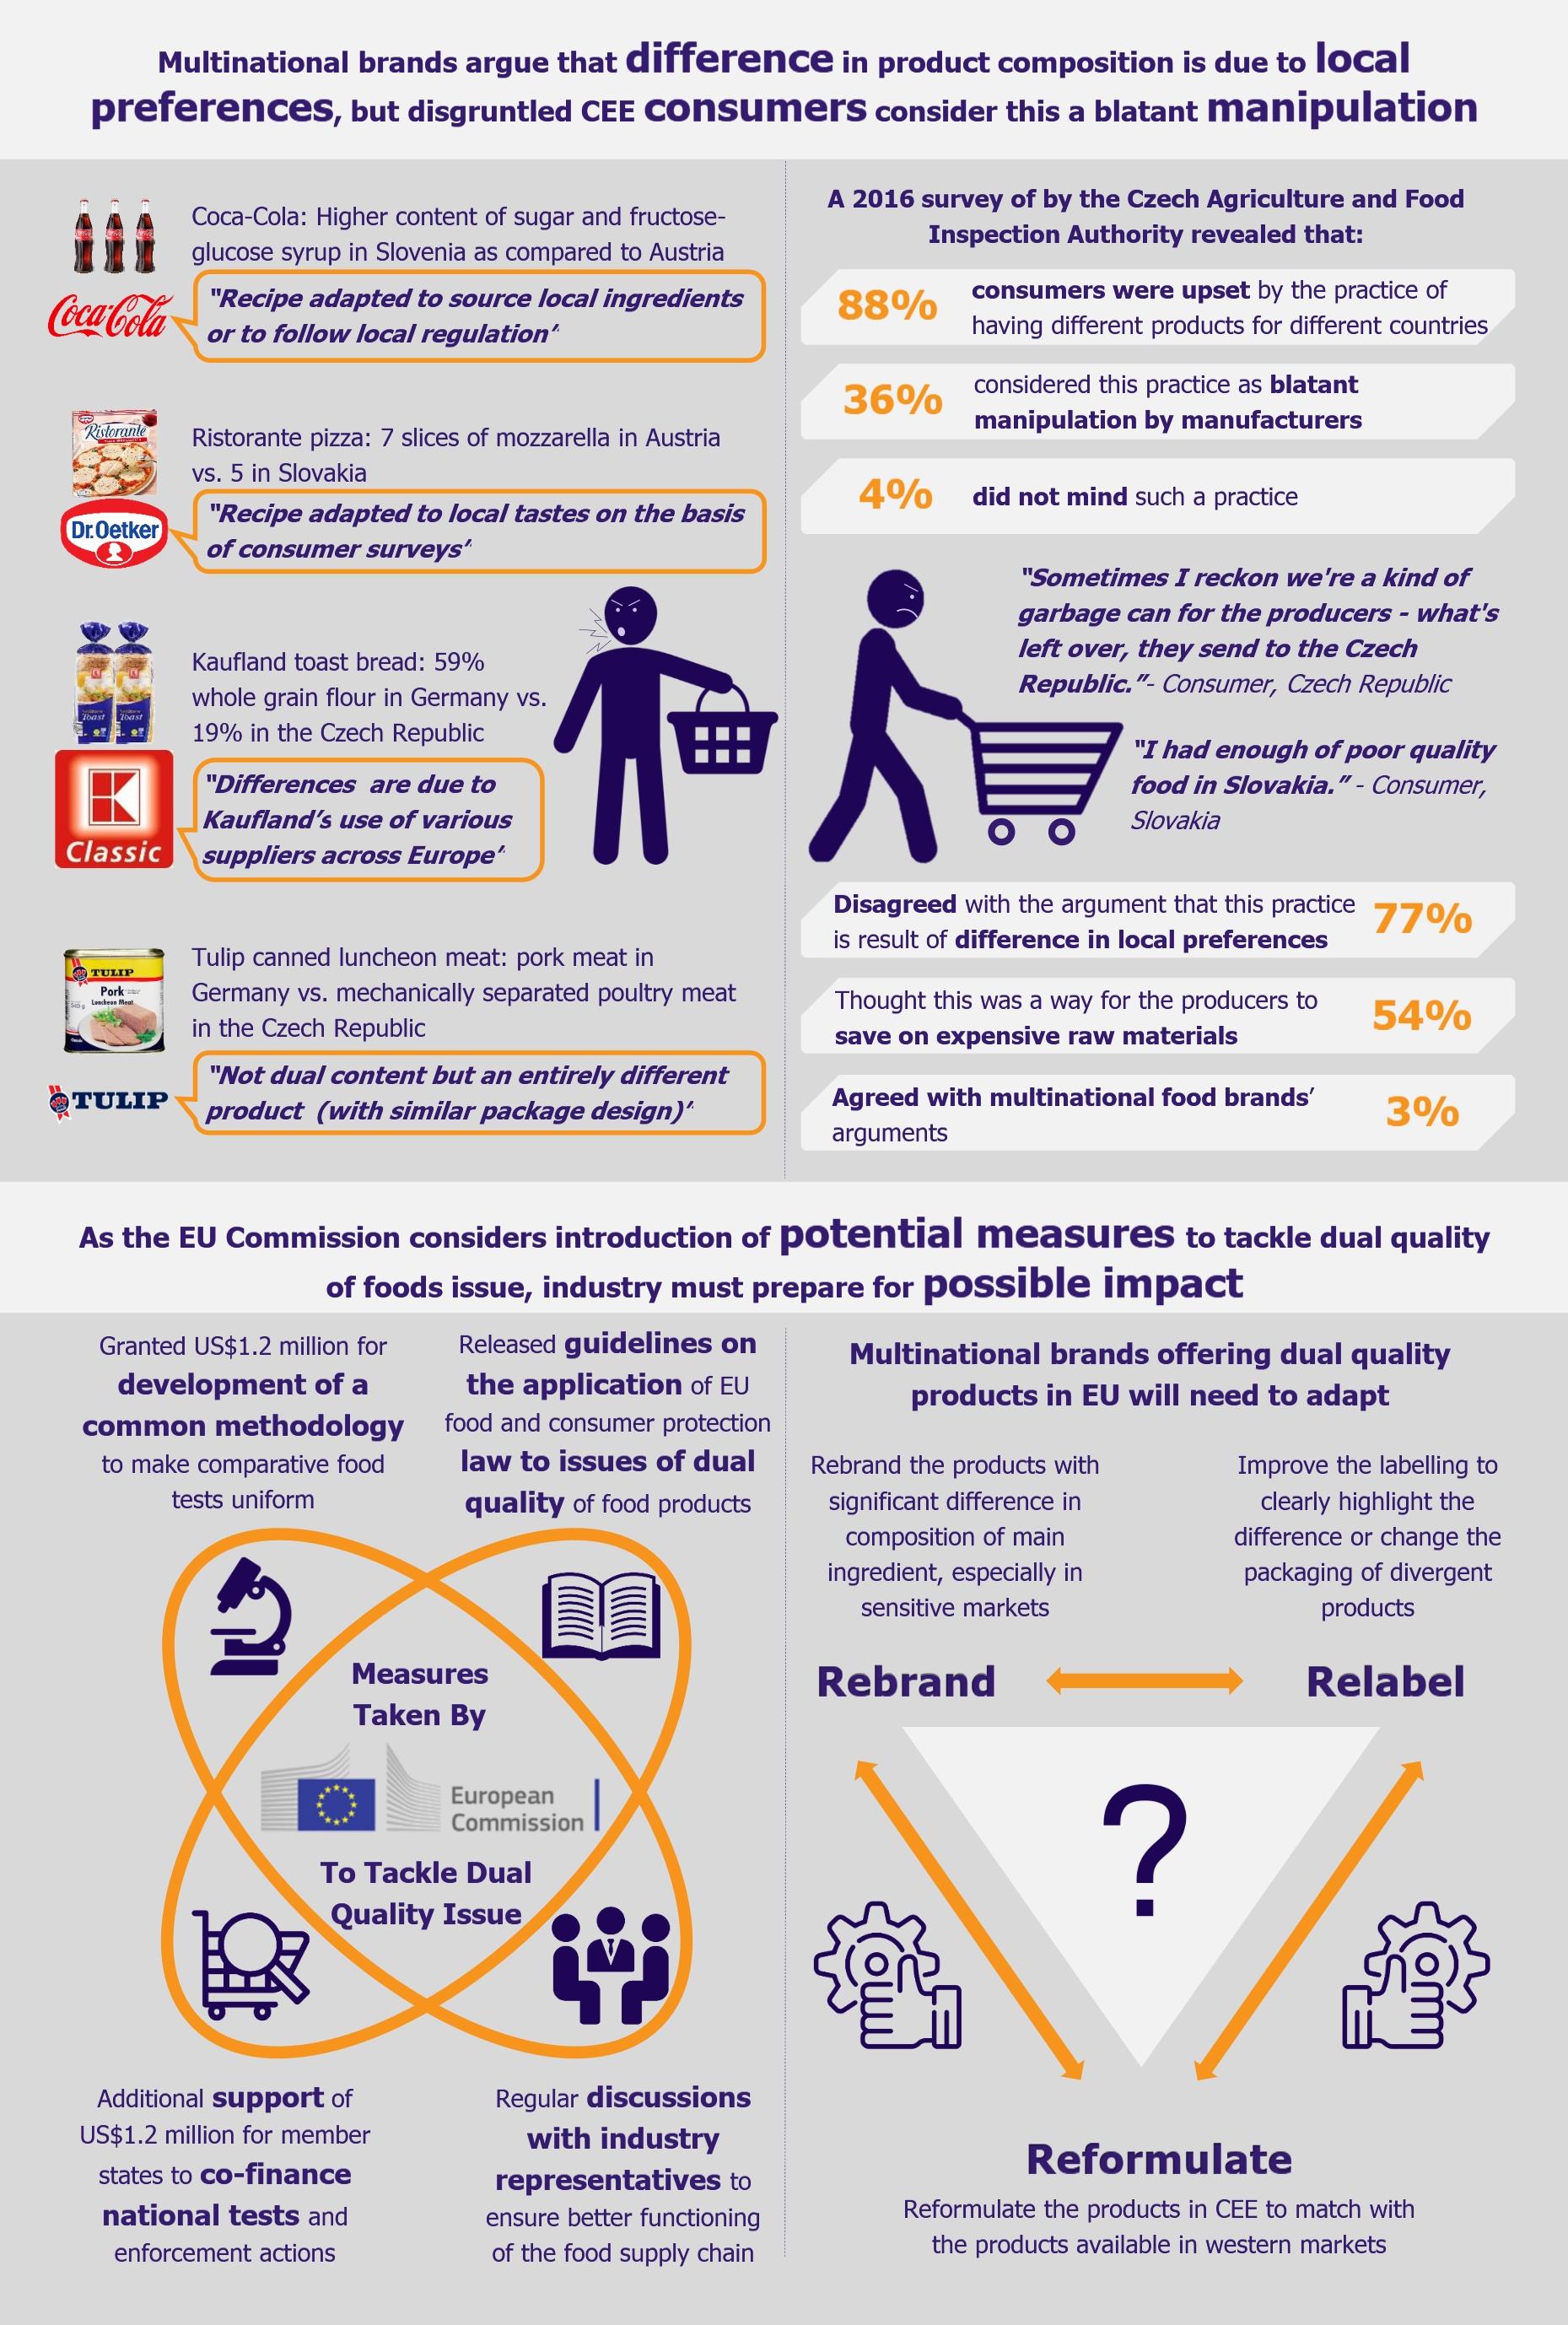 EU-Dual Quality of Food Products